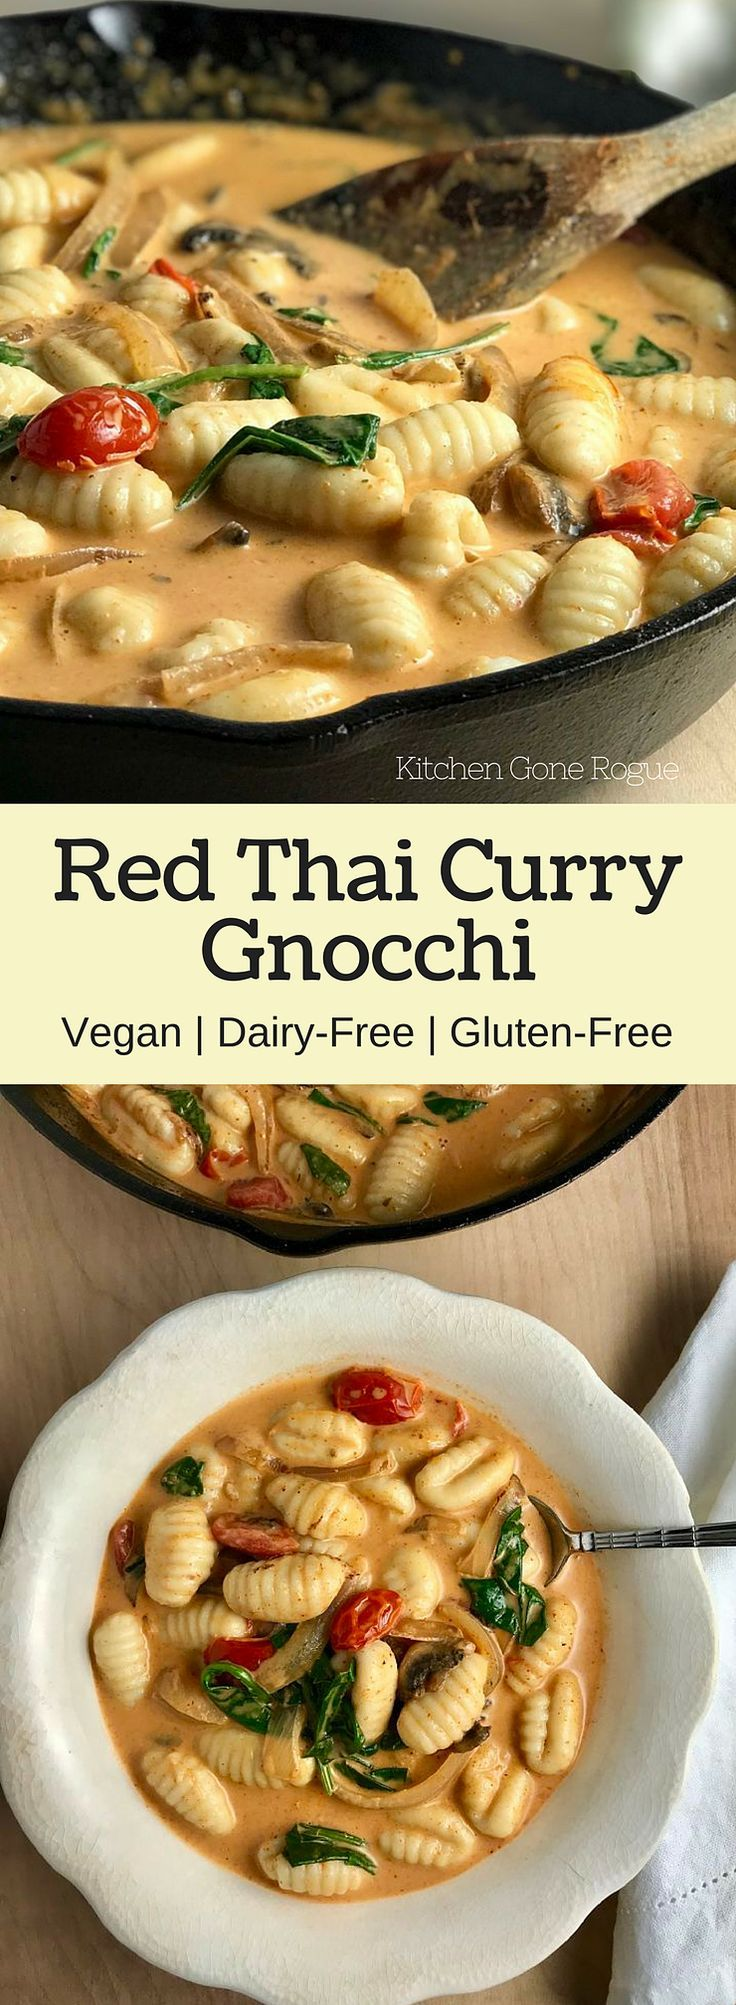 follow me @cushite Red Thai Curry Gnocchi Gluten Free Vegan Dairy Free Kitchen Gone Rogue